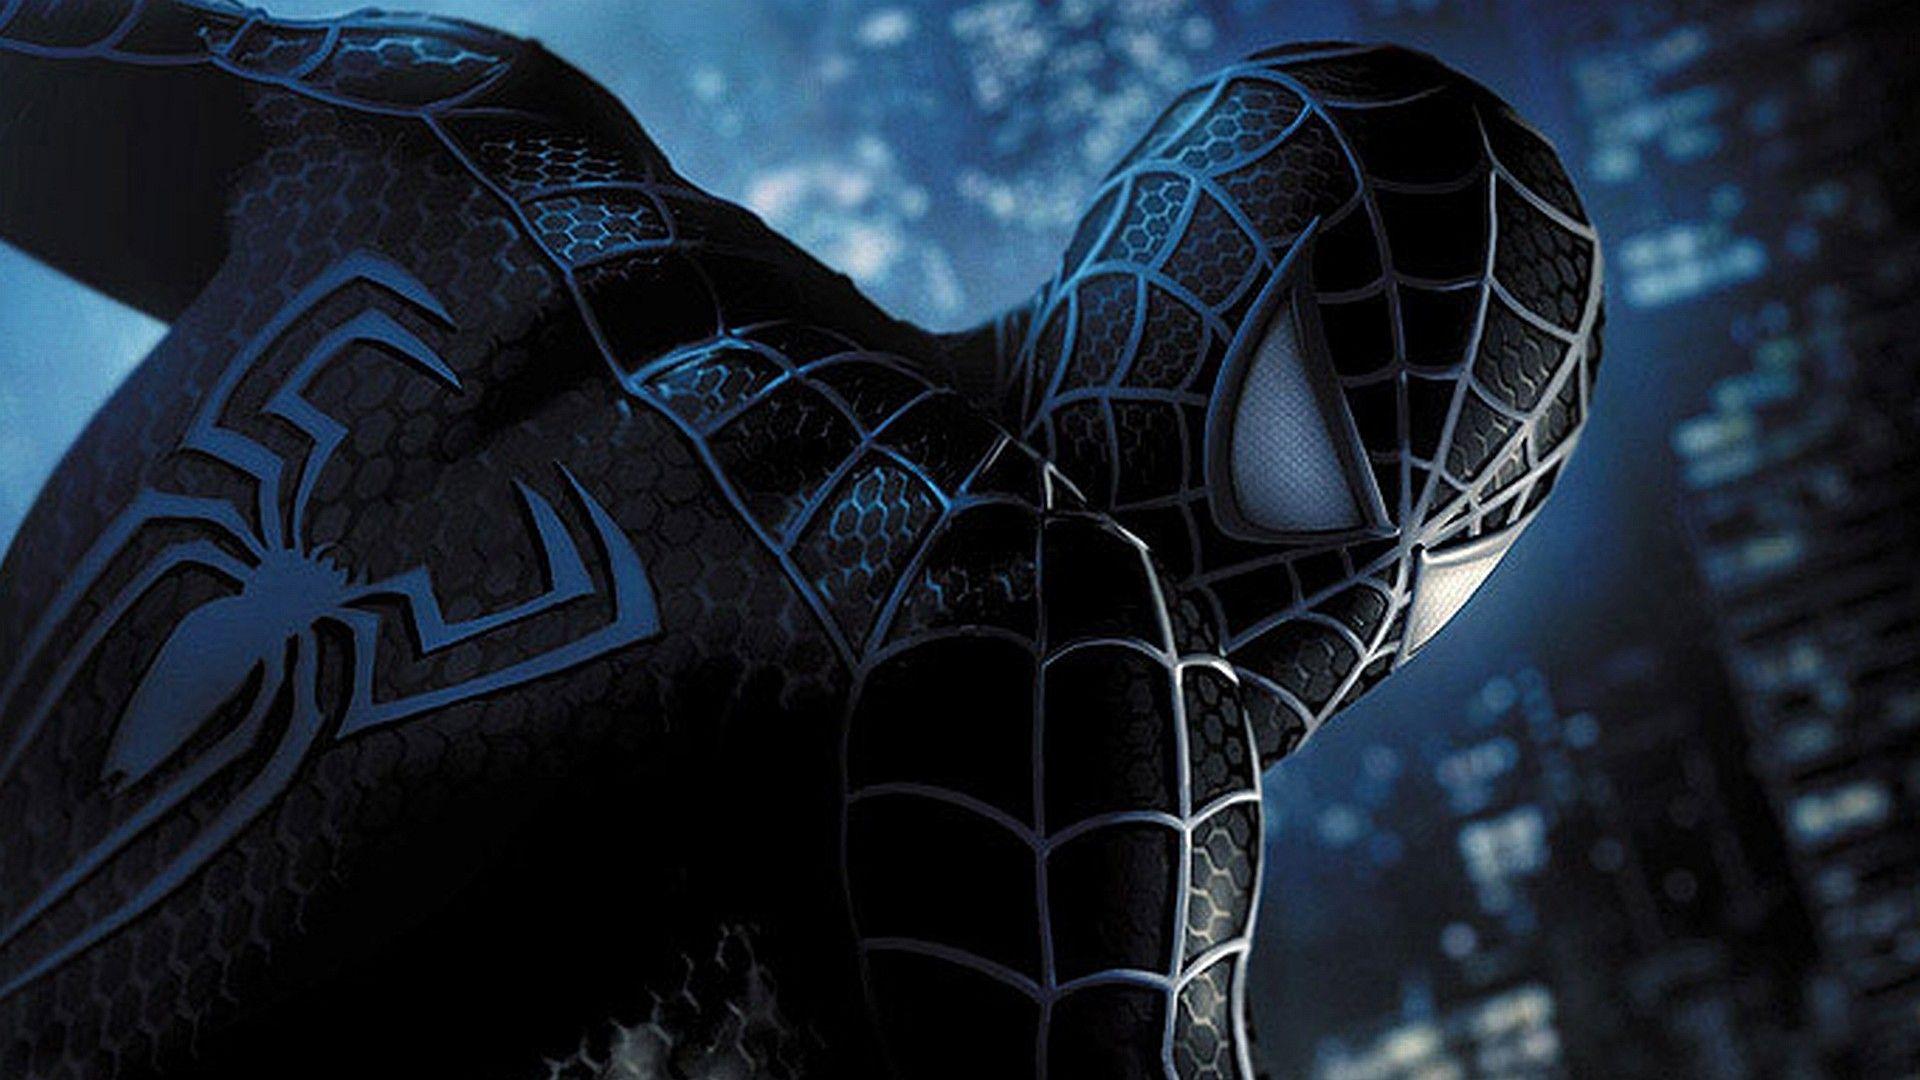 1920x1080 Free Spiderman And Venom Wallpaper Background Black Spiderman Spiderman Comic Spiderman 3 Wallpaper